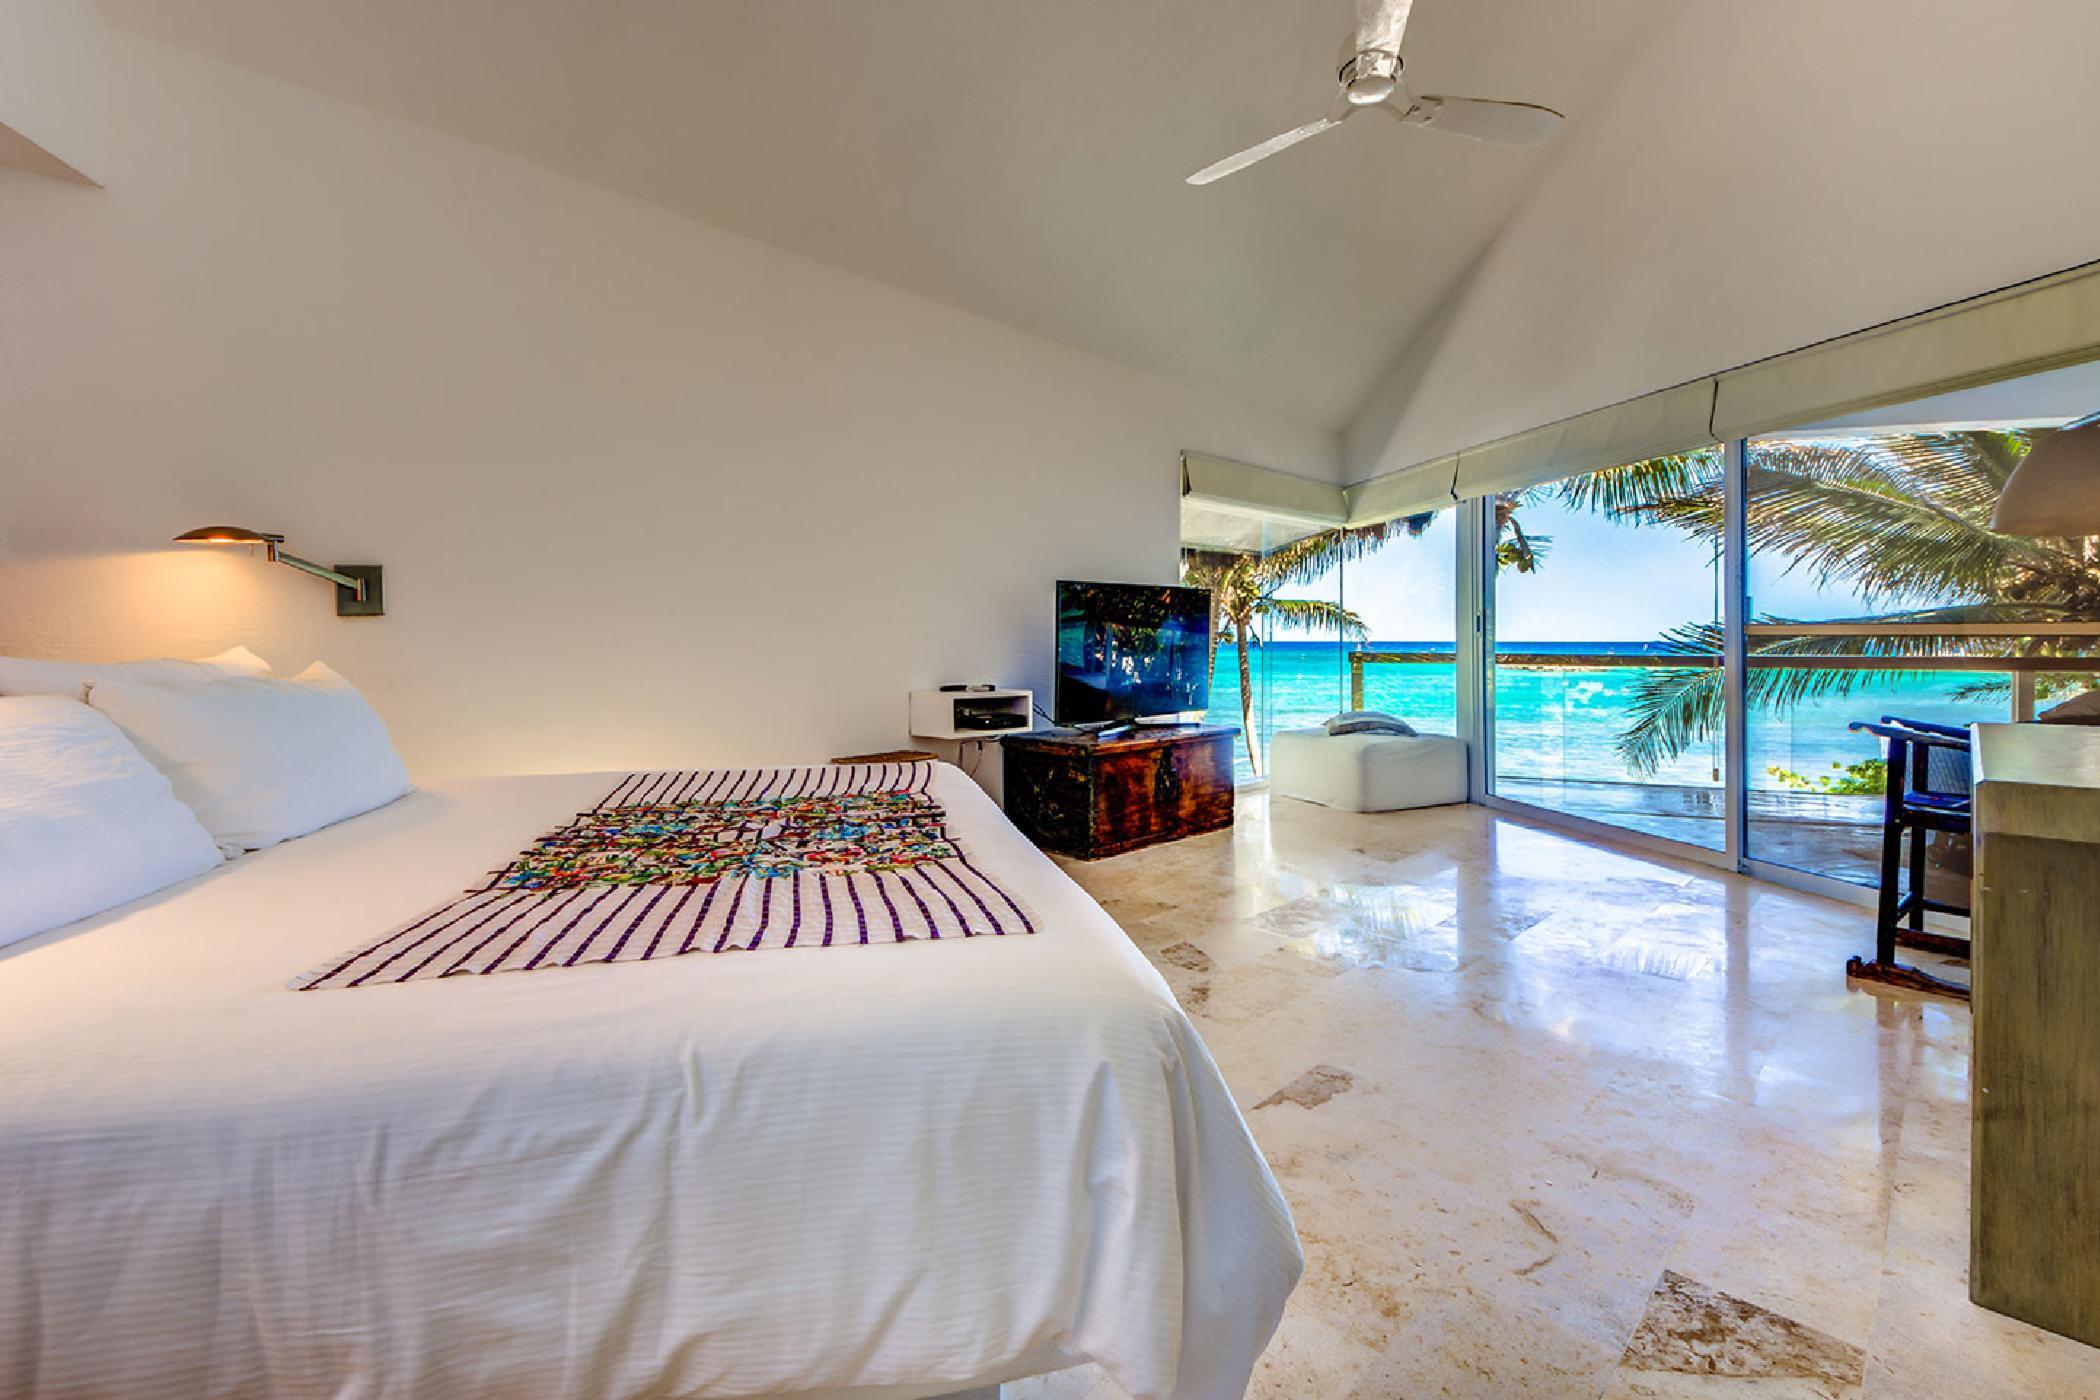 Maya_Luxe_Riviera_Maya_Luxury_Villas_Experiences_Puerto_Aventuras_5_Bedrooms_Zacil_Na_12.jpg